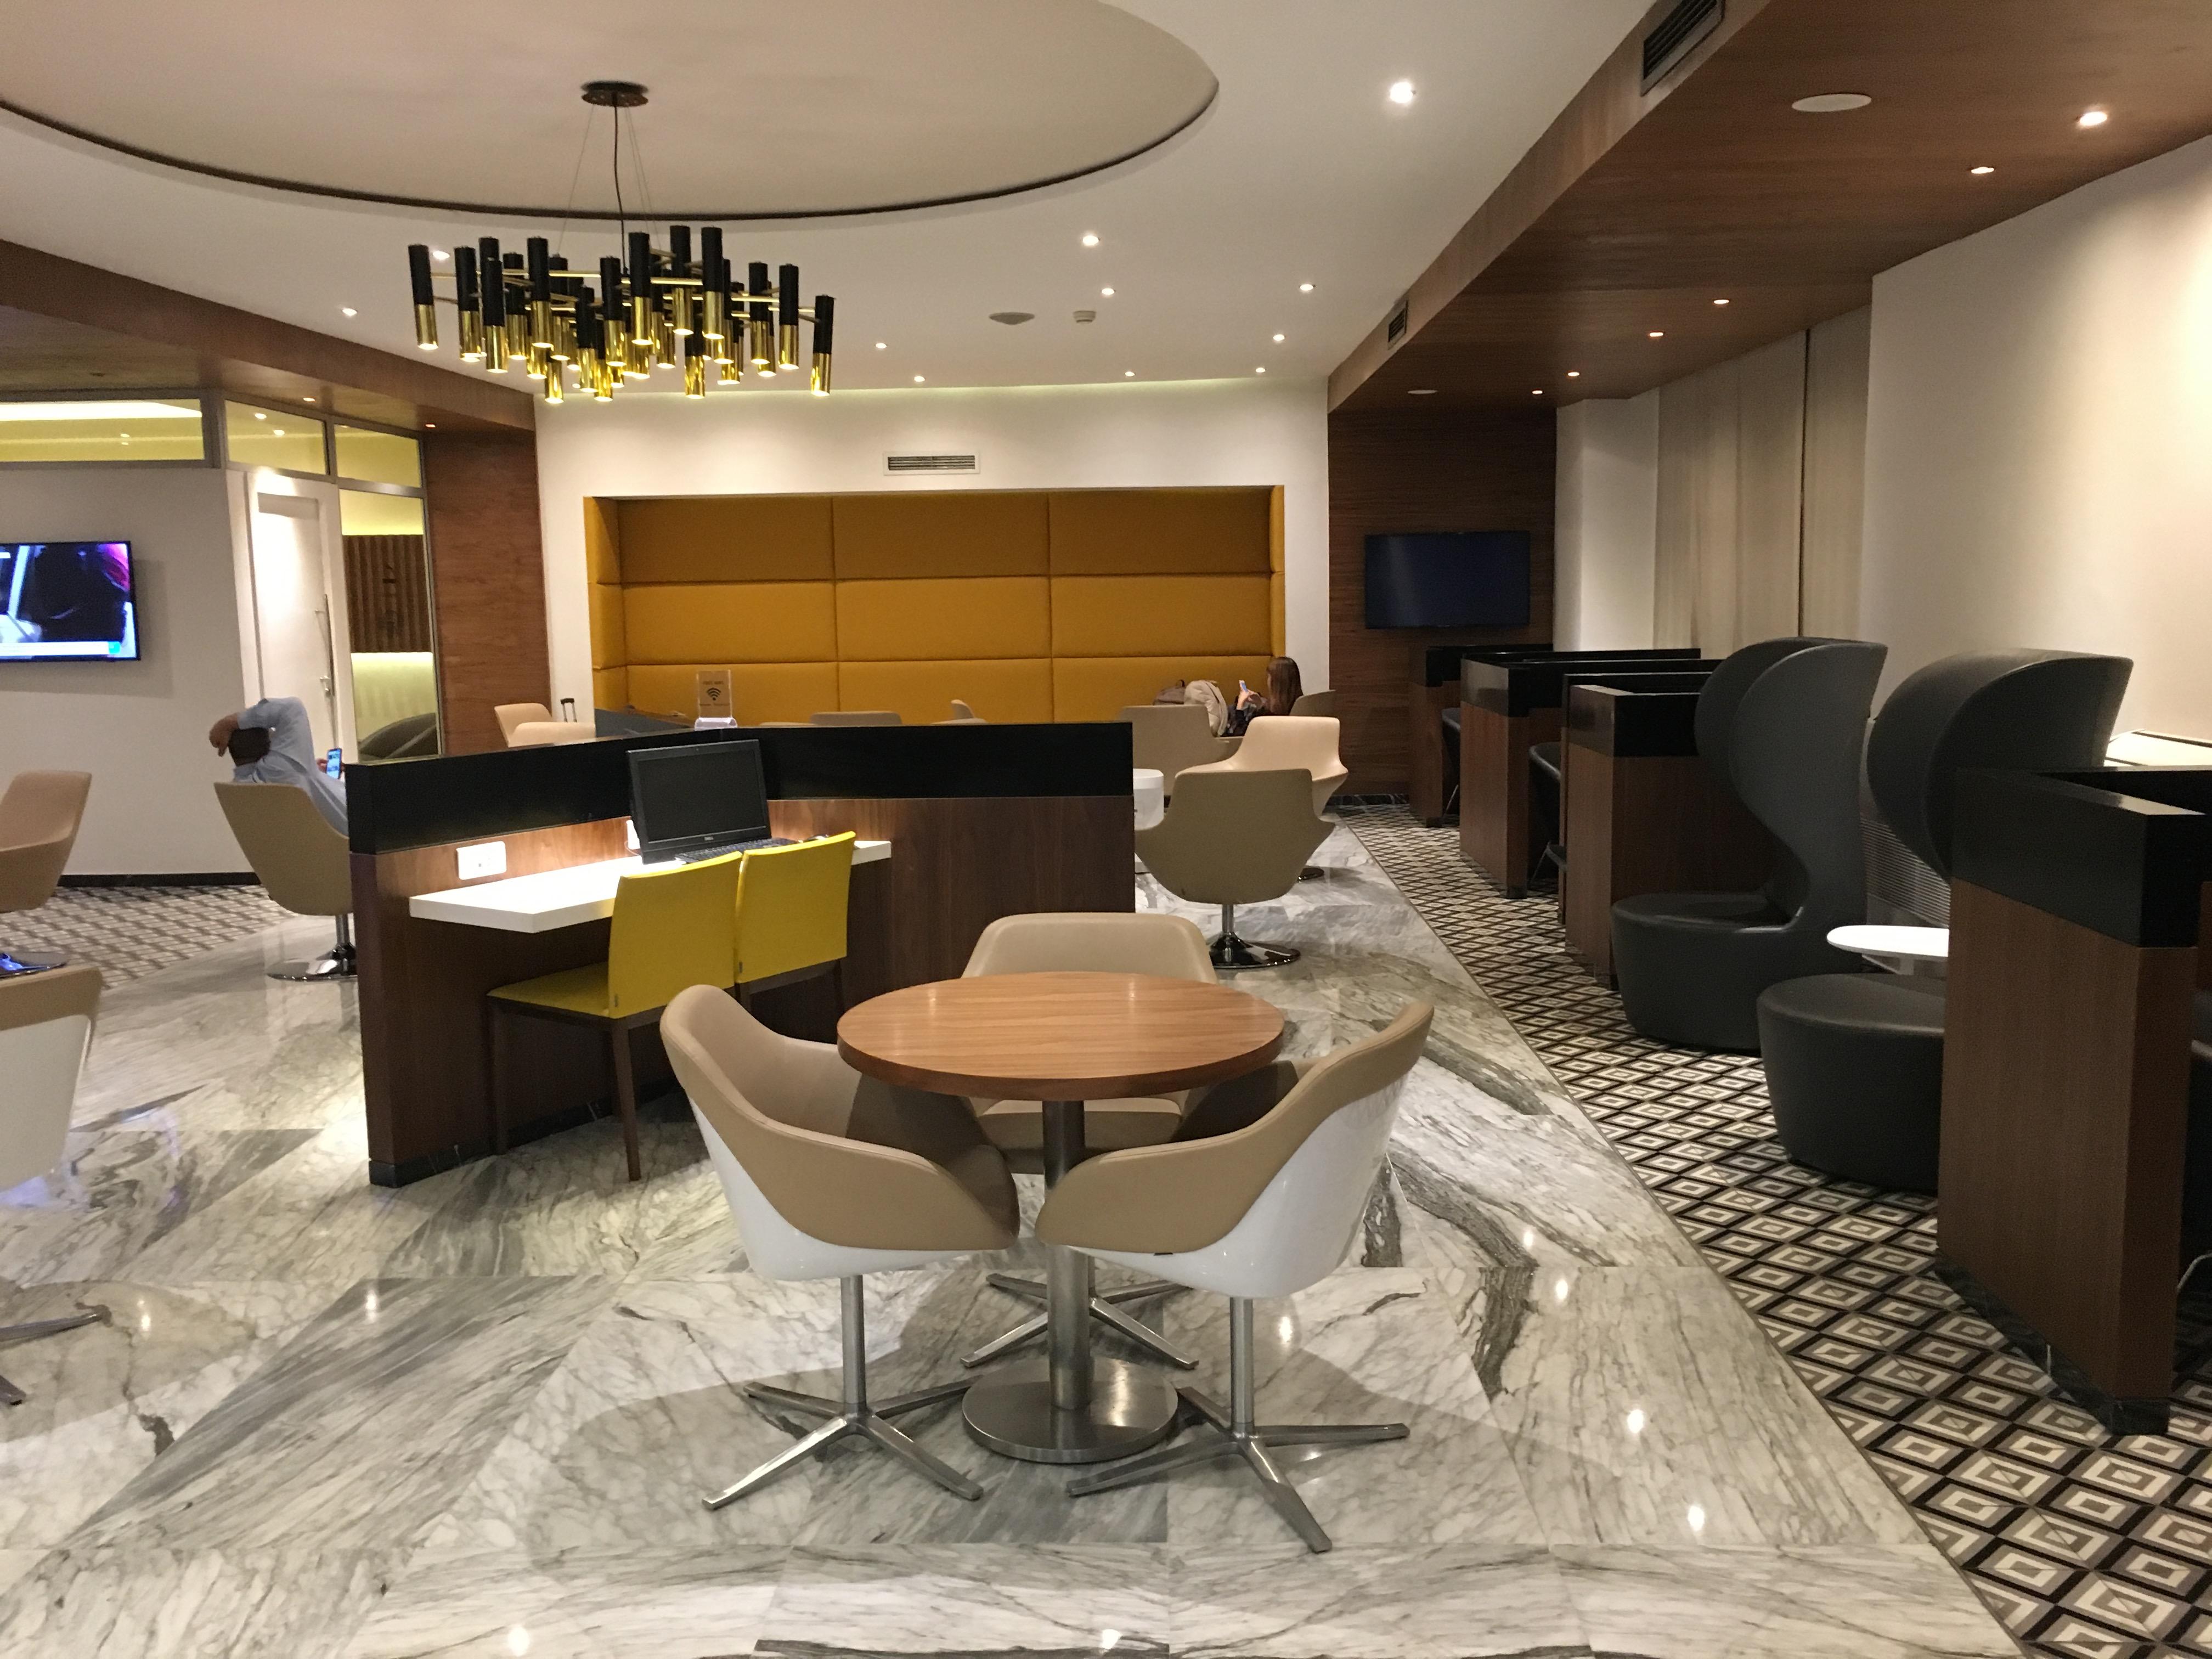 Lounge Review : カサブランカ空港(CMN) パールラウンジ(Pearl Lounge)